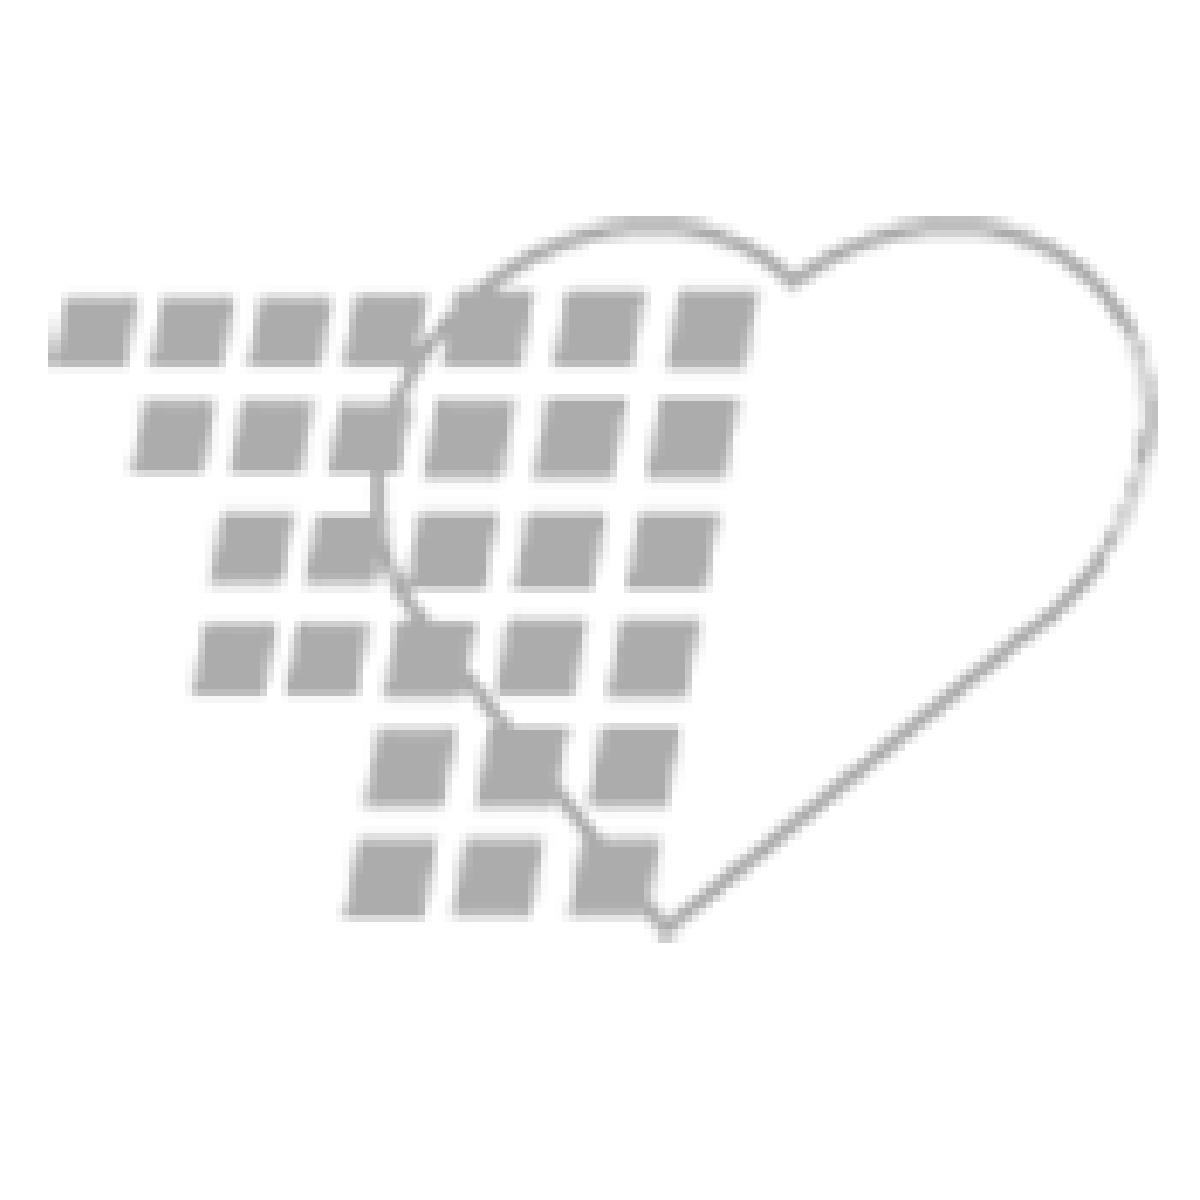 06-93-3114 - Demo Dose® Tuberculn, PPD (Aplisl) 5 mL (5 TU/0.1 mL ID)